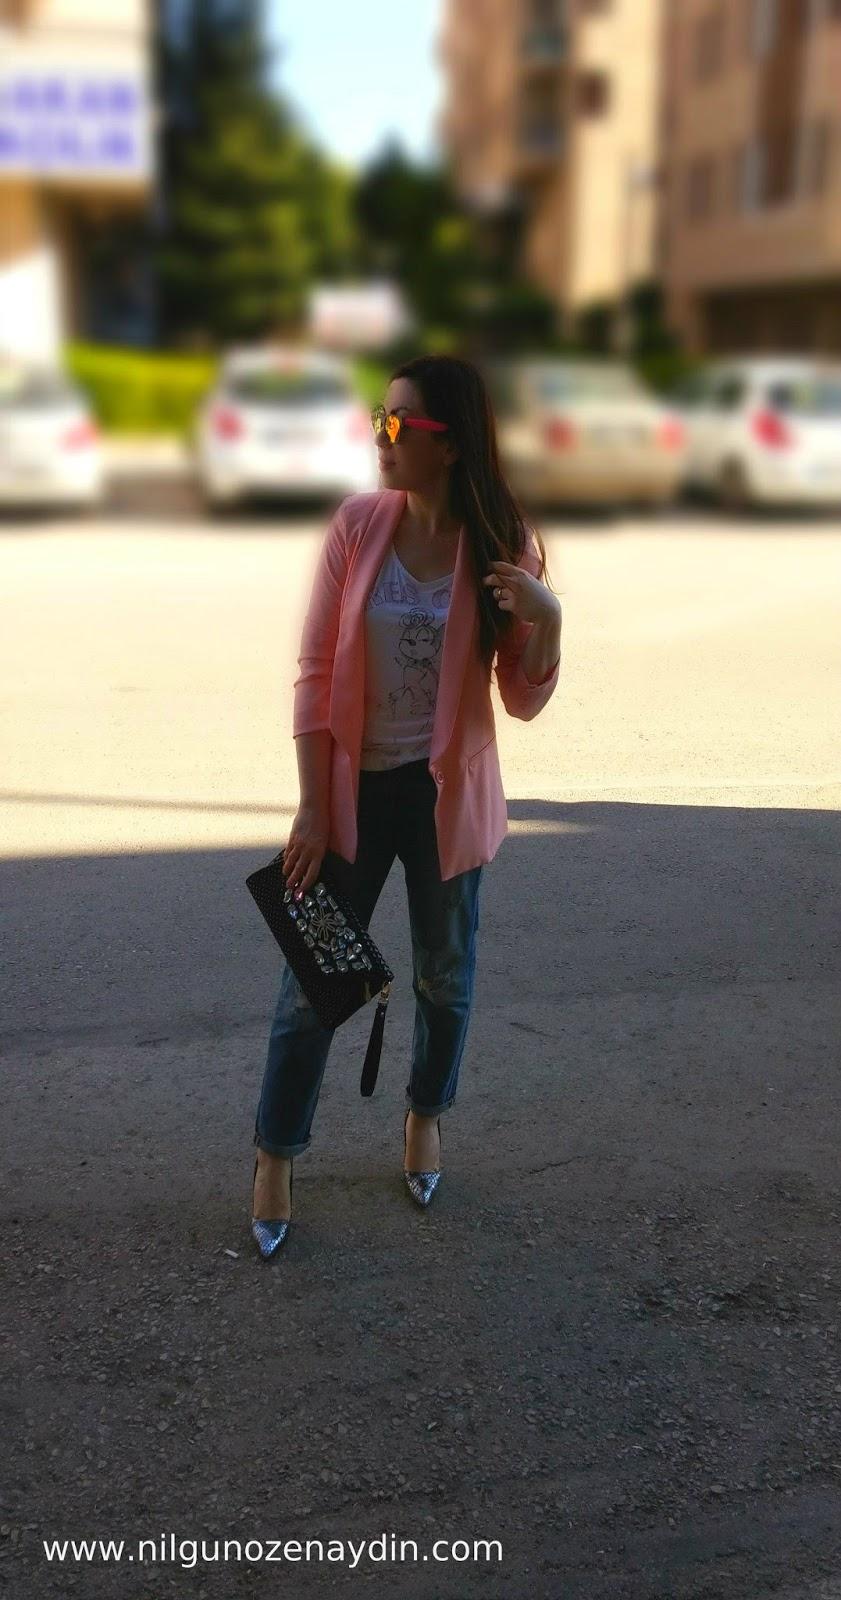 www.nilgunozenaydin.com-moda blogu-fashion blog-fashion blogger-shein-moda siteleri-my outfit